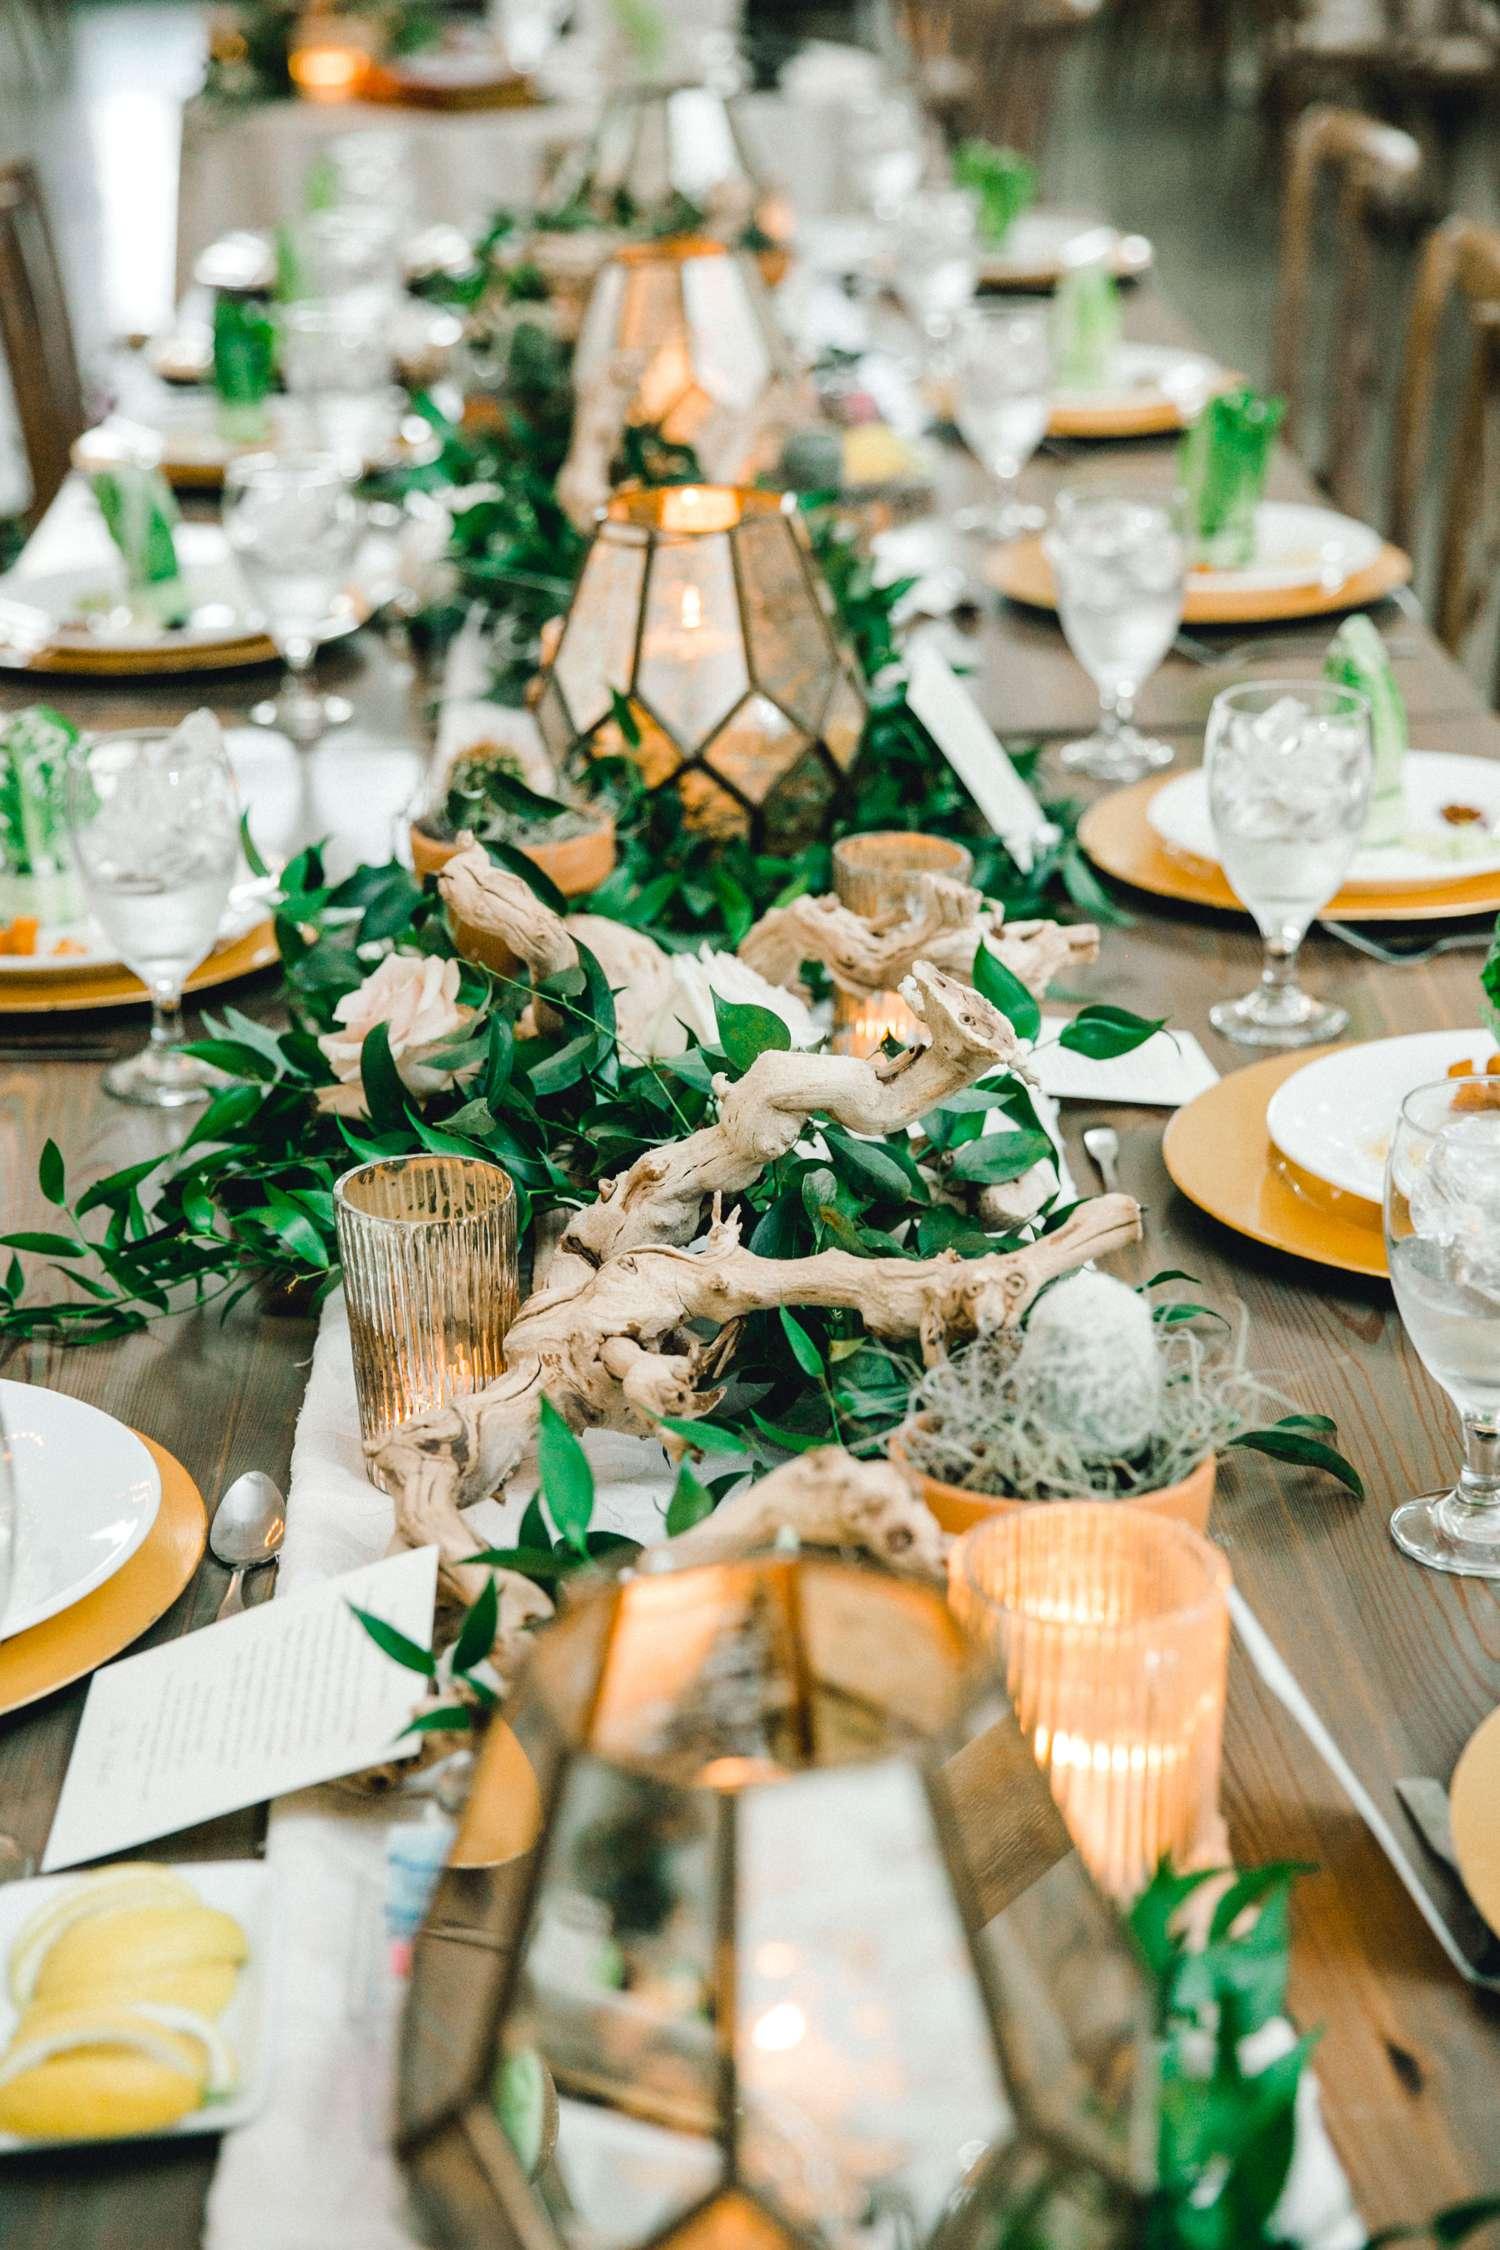 HEBERT_MORGAN_AND_CLAY_ALLEEJ_THE_FARMHOUSE_MONTGOMERY_TEXAS_WEDDING_0124.jpg